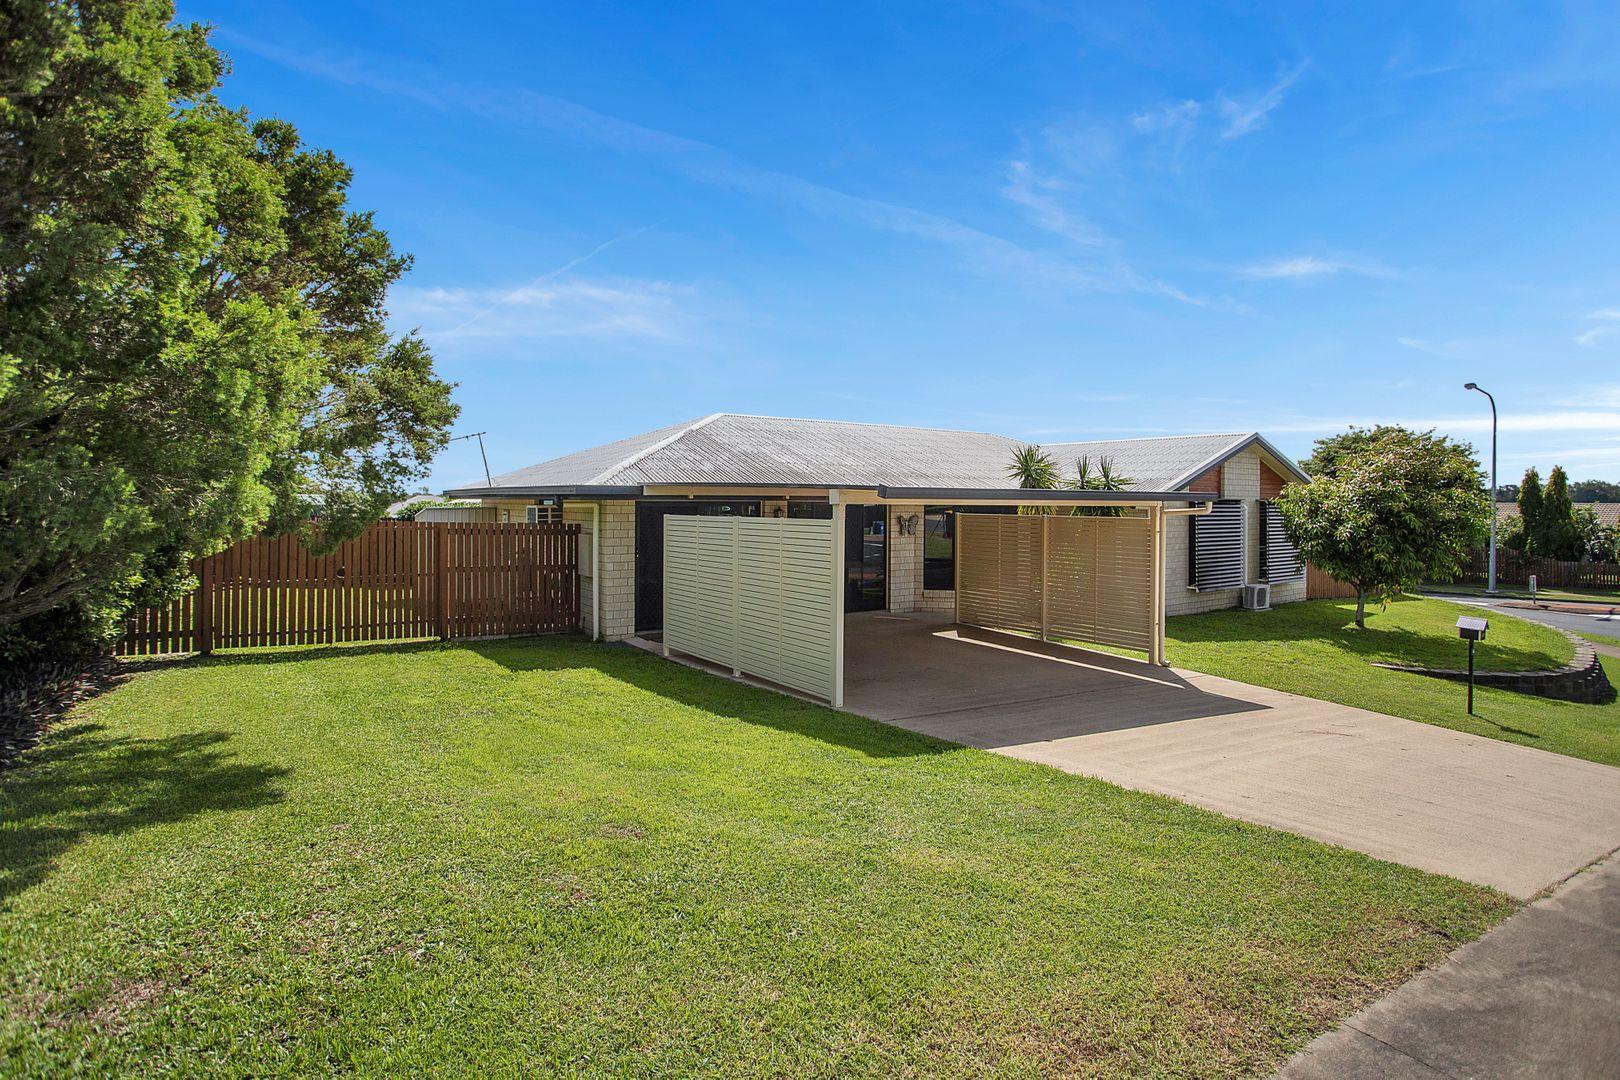 45 George Jane Street, Walkerston QLD 4751, Image 0